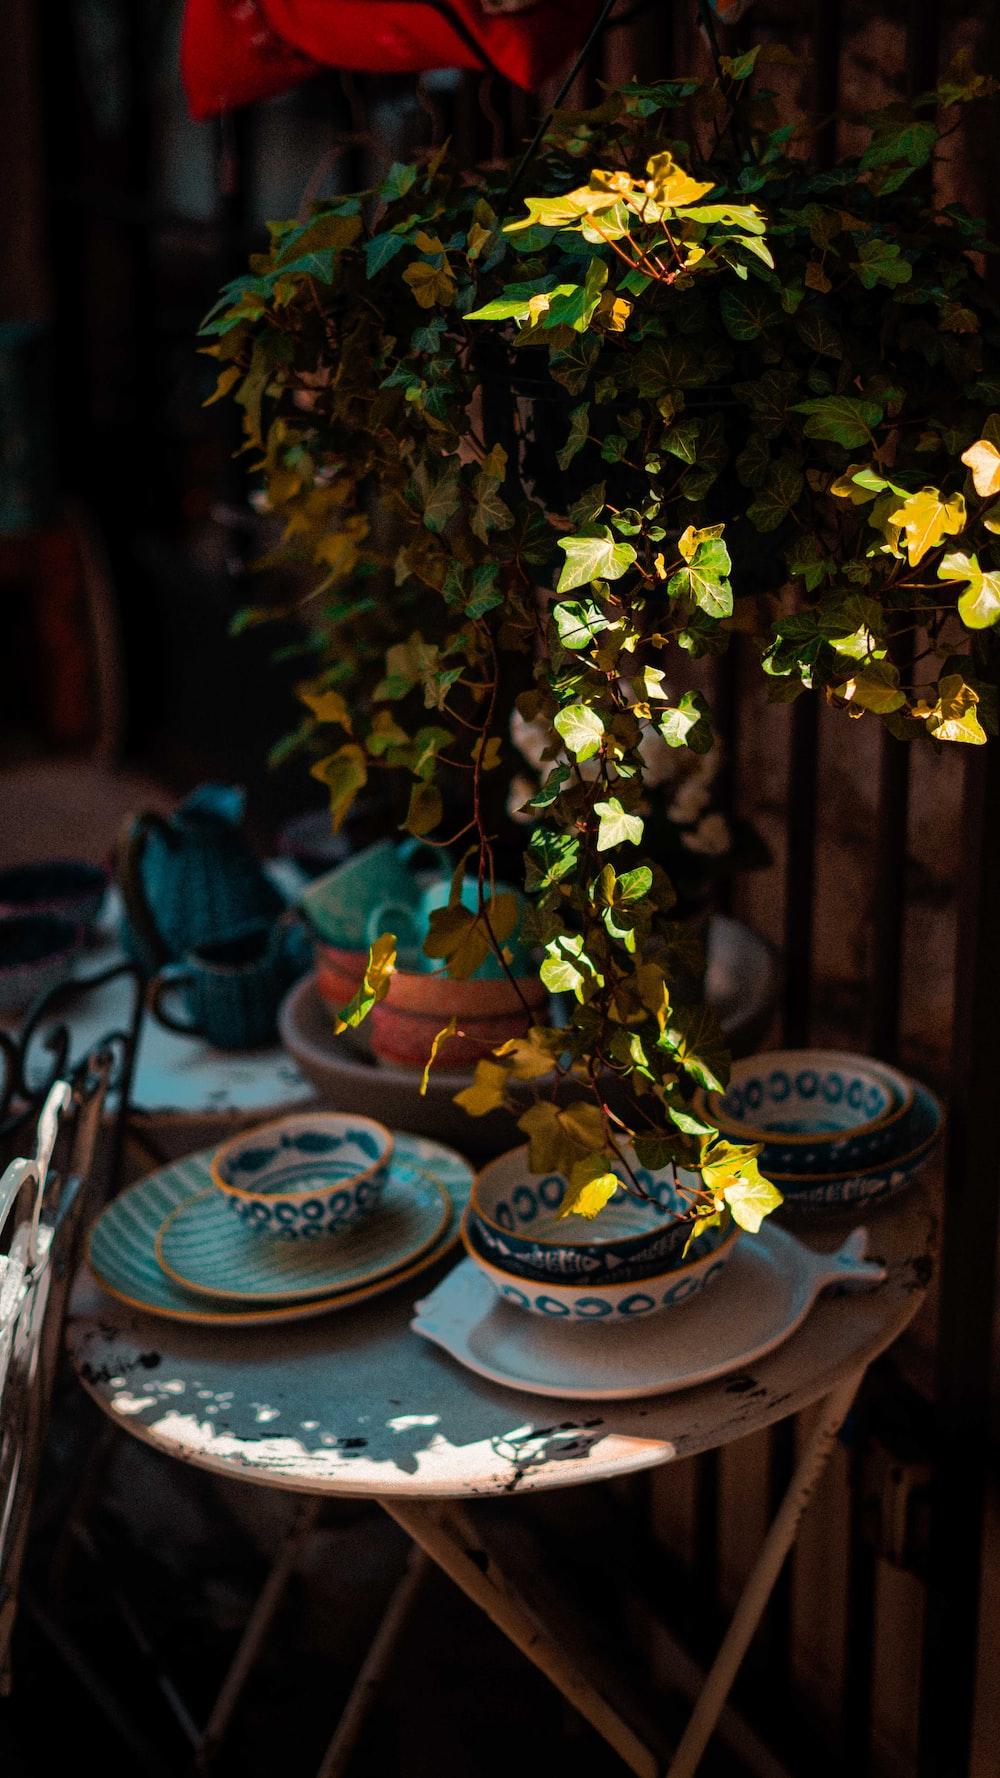 green plant on blue ceramic saucer